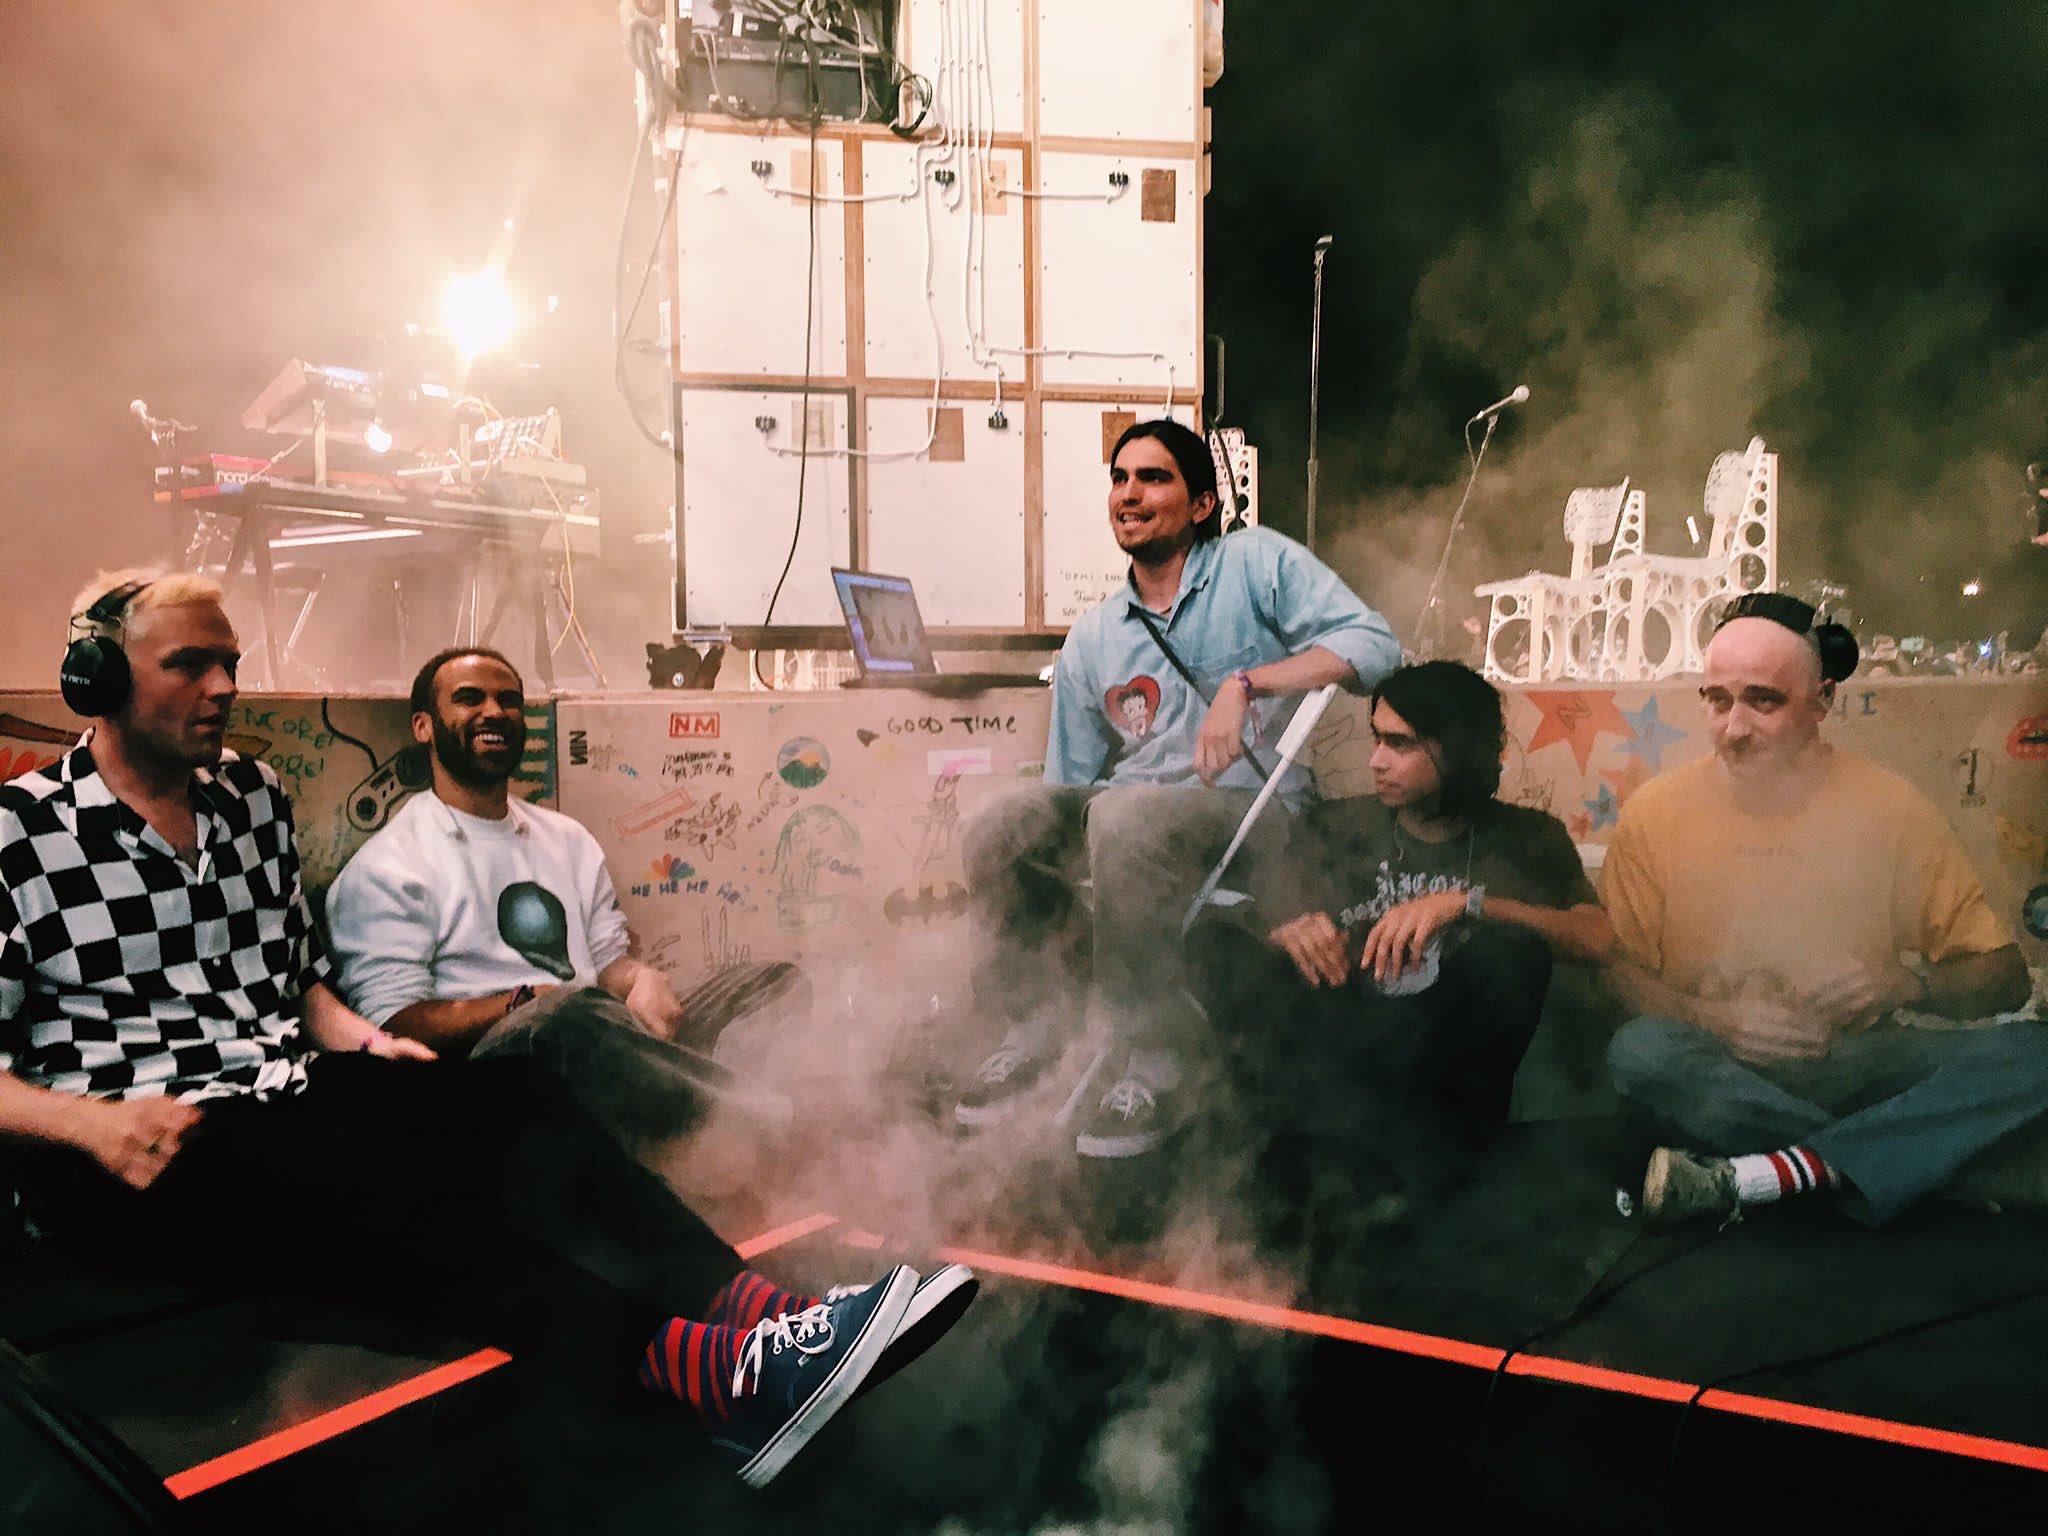 Frank Ocean Live Band 2017 Festivals